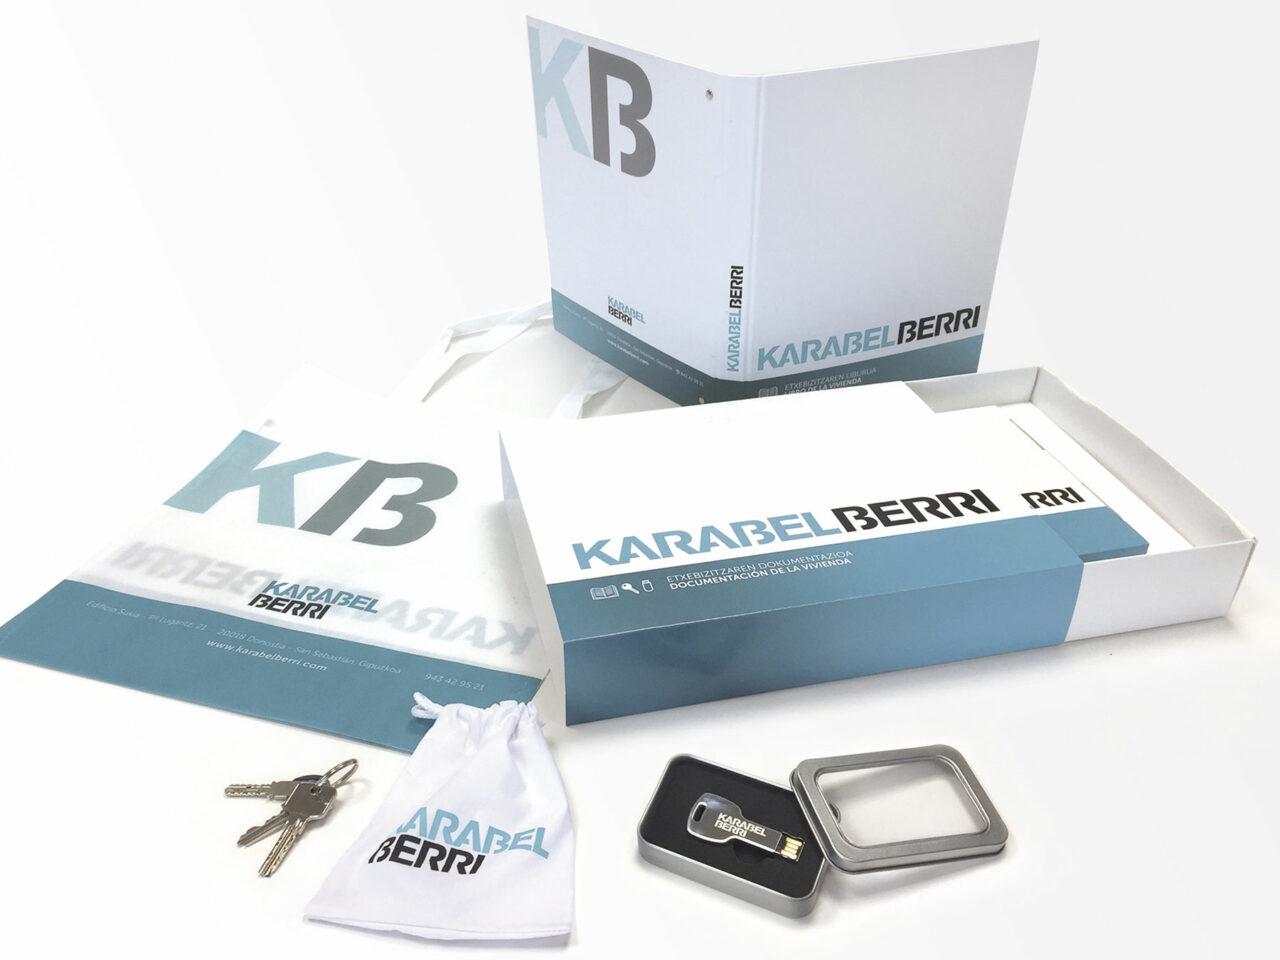 Kit vivienda llave, archivador, caja , bolsa Karabel Berri